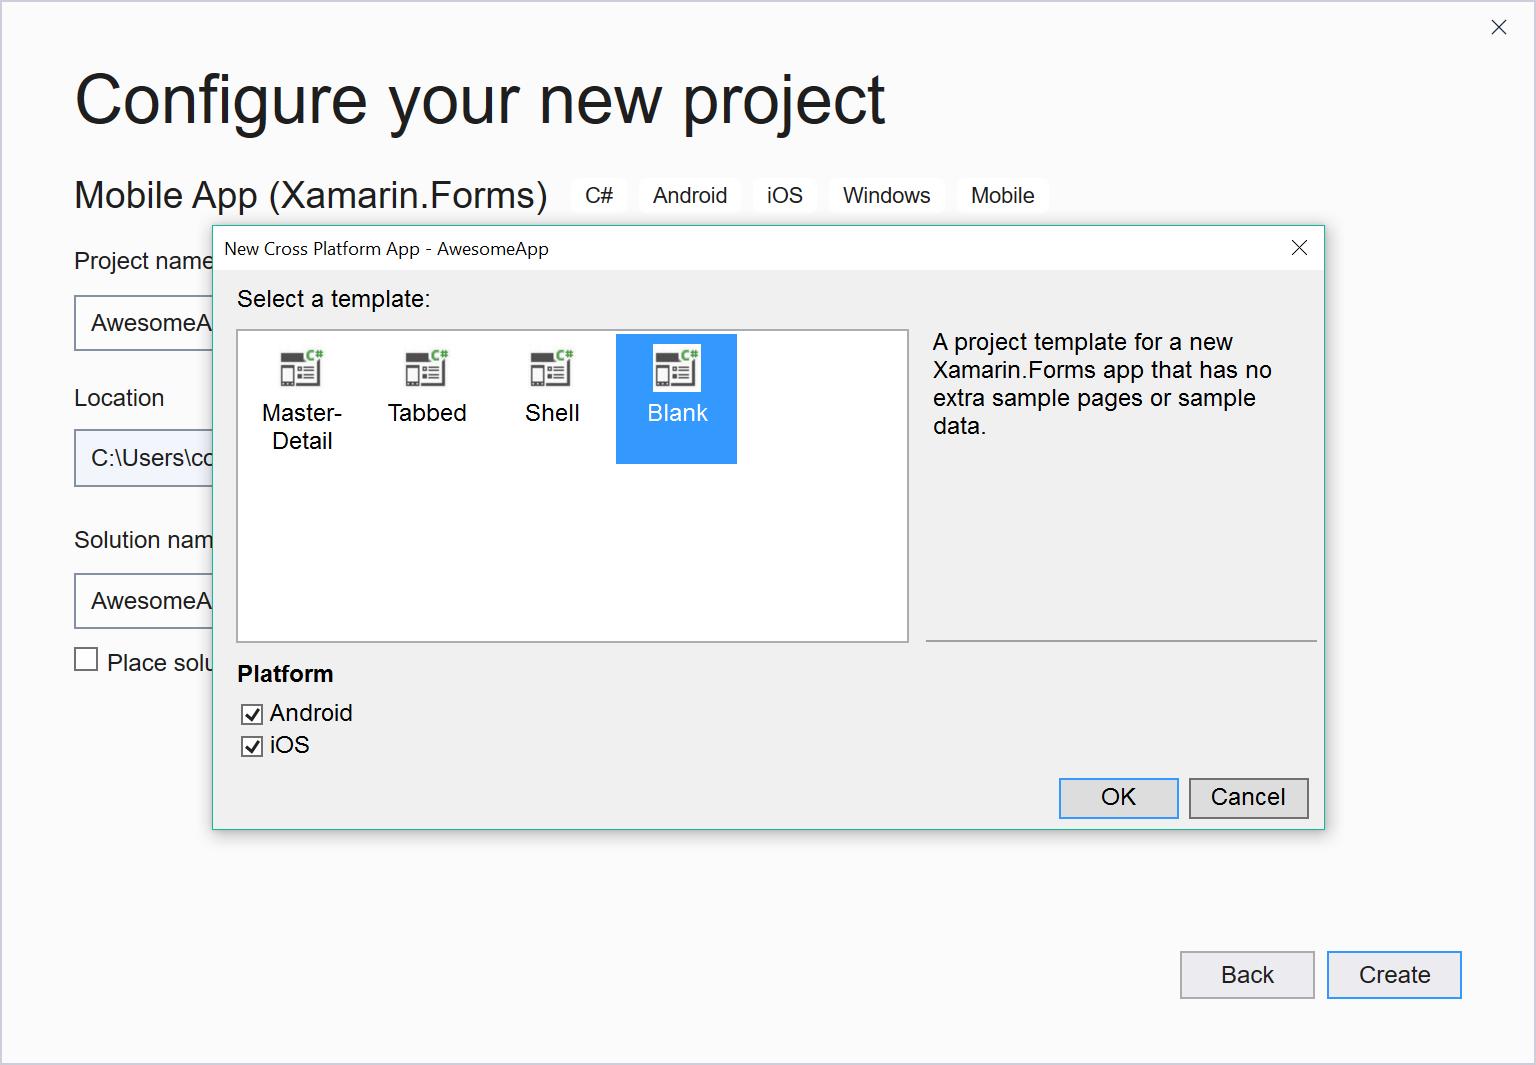 Build your first Xamarin Forms app - Xamarin | Microsoft Docs